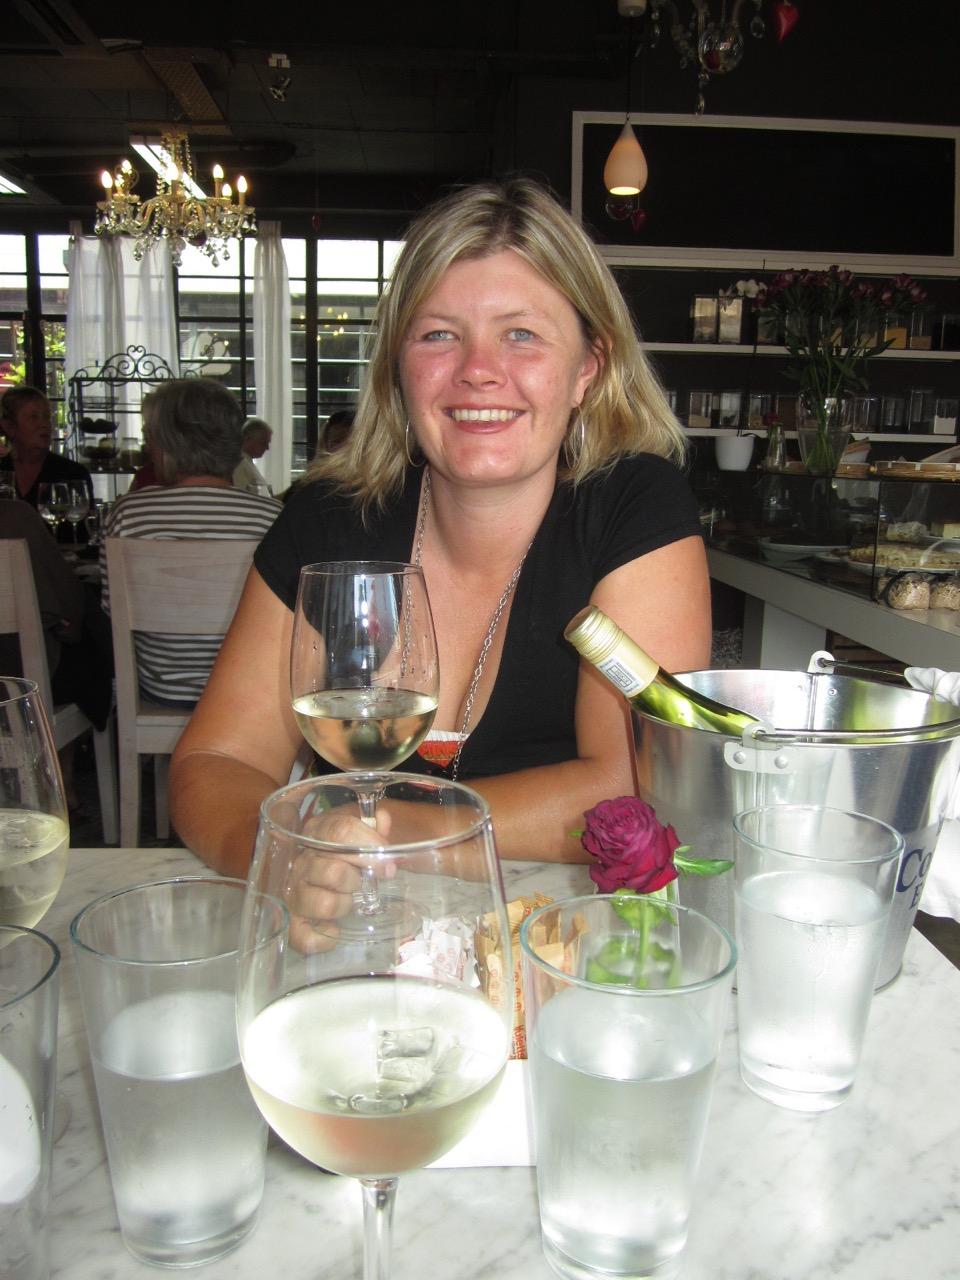 Pam wine pic 2